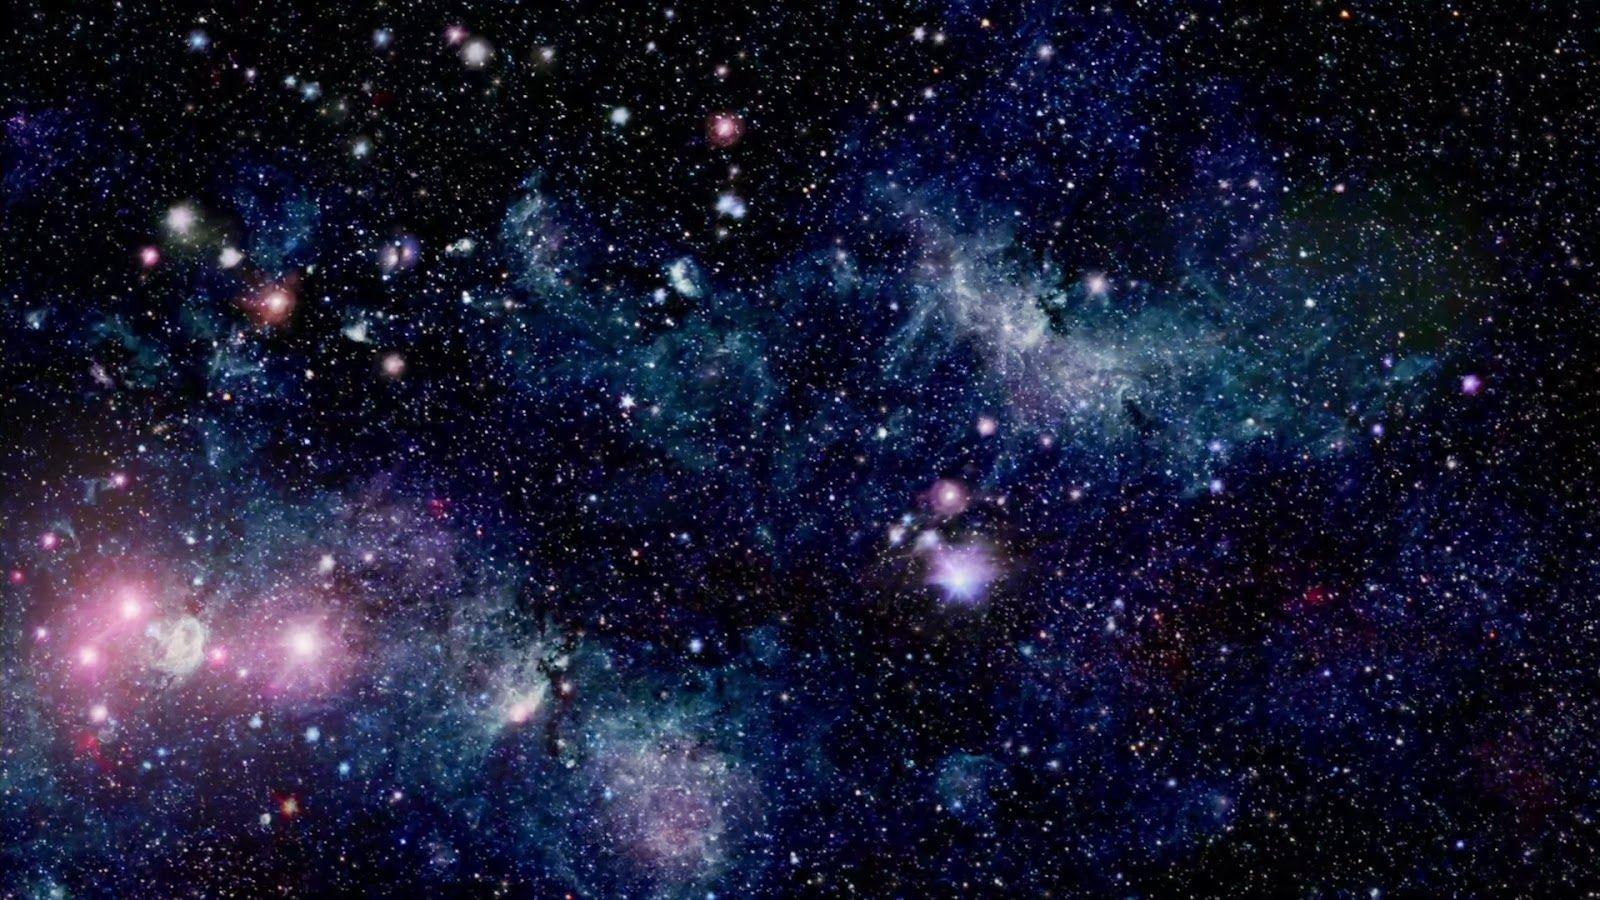 Wallpapers hd espacio planetas galaxias identi for Espacio exterior 4k